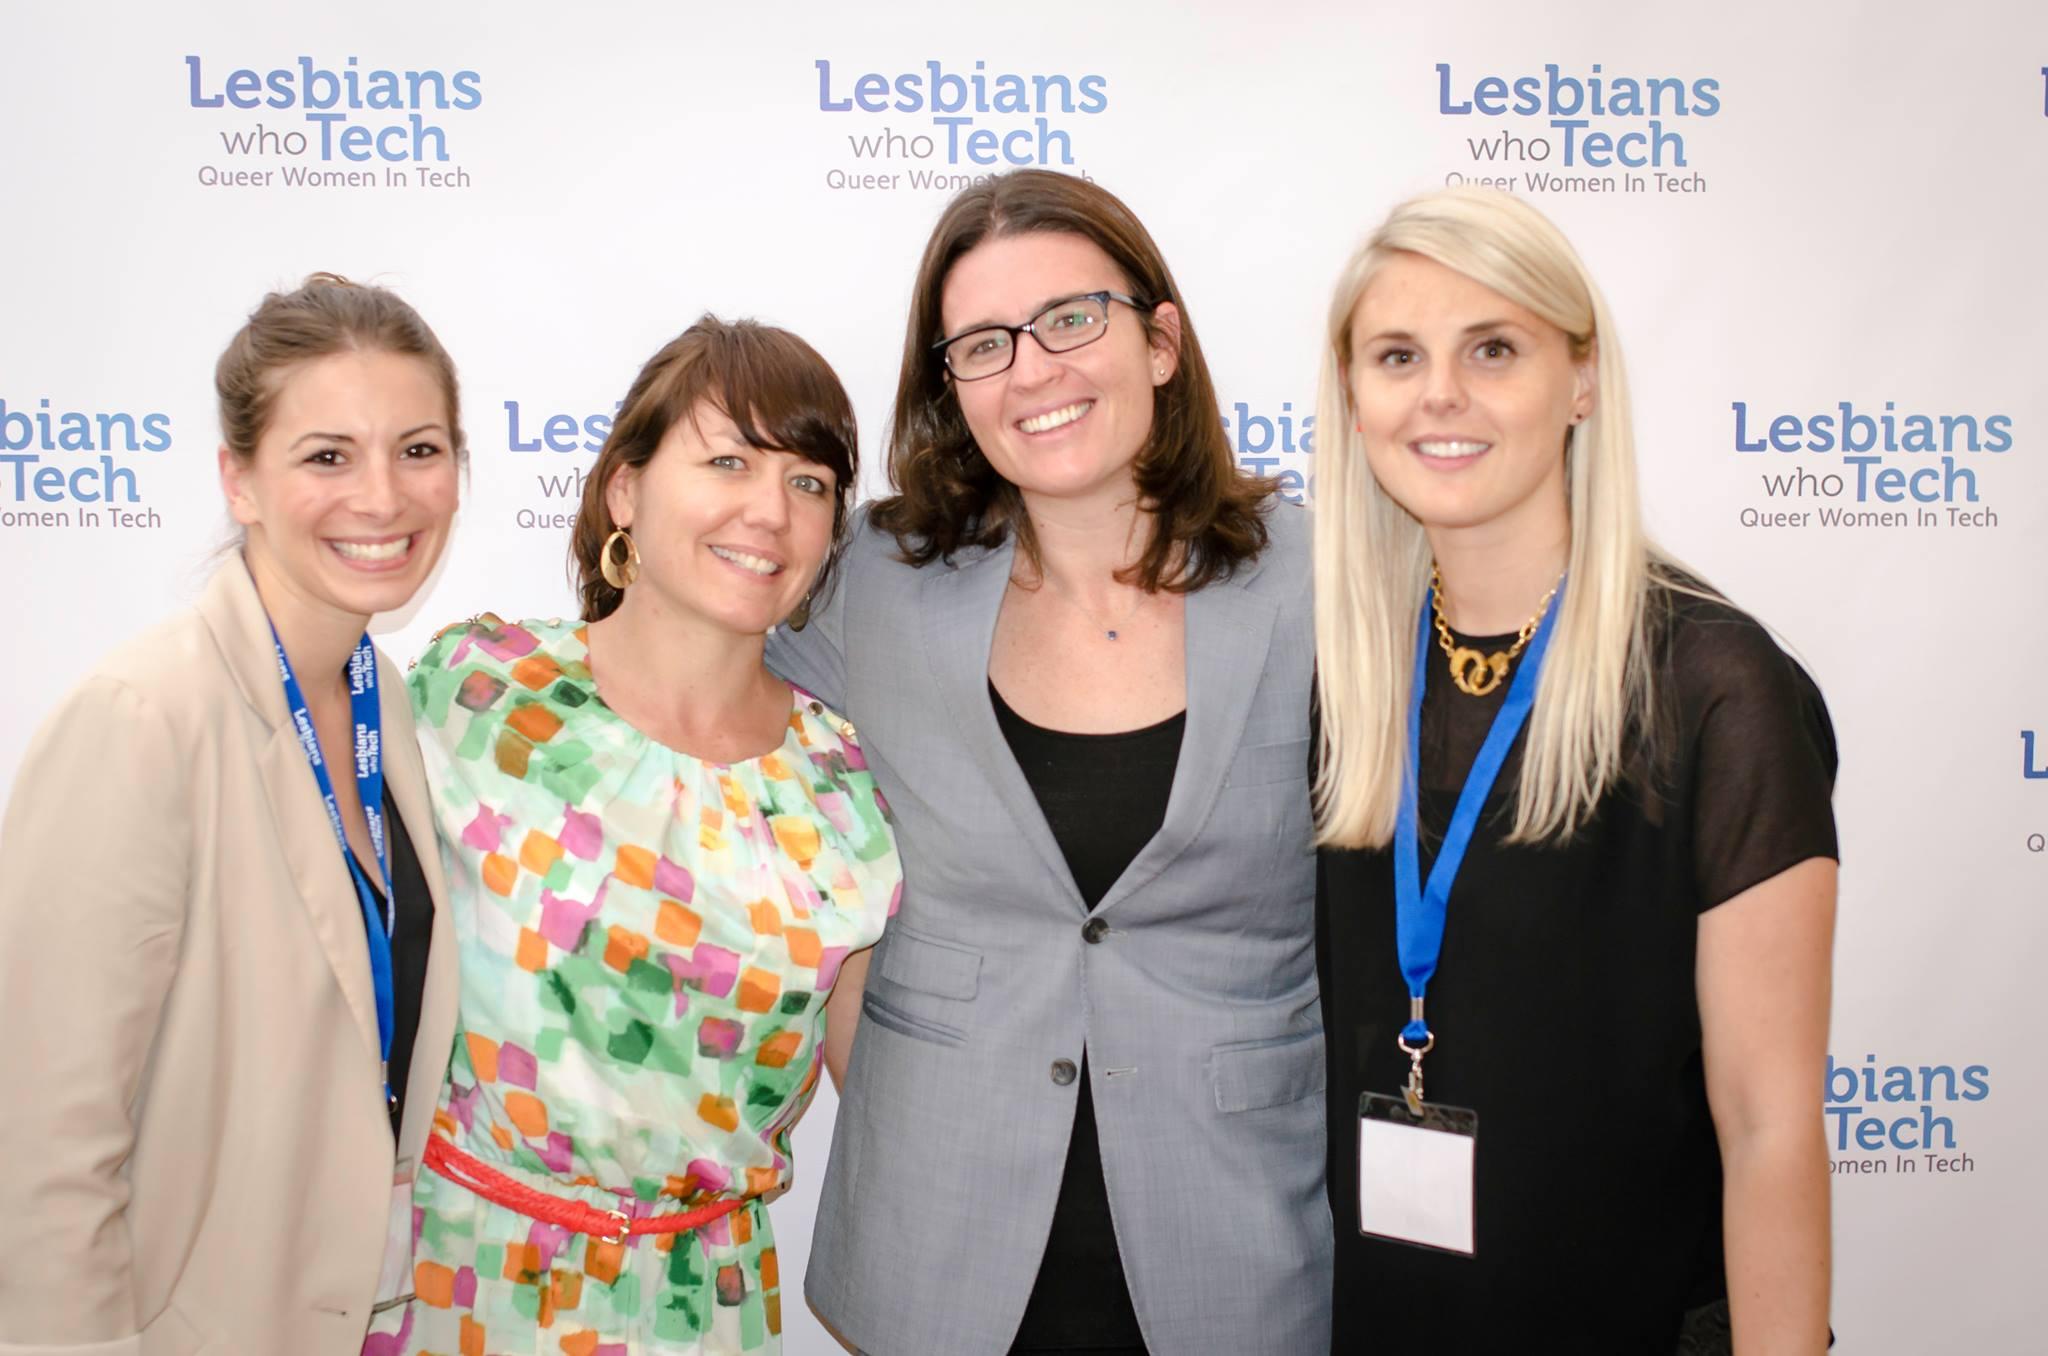 Houston lesbian events 2011